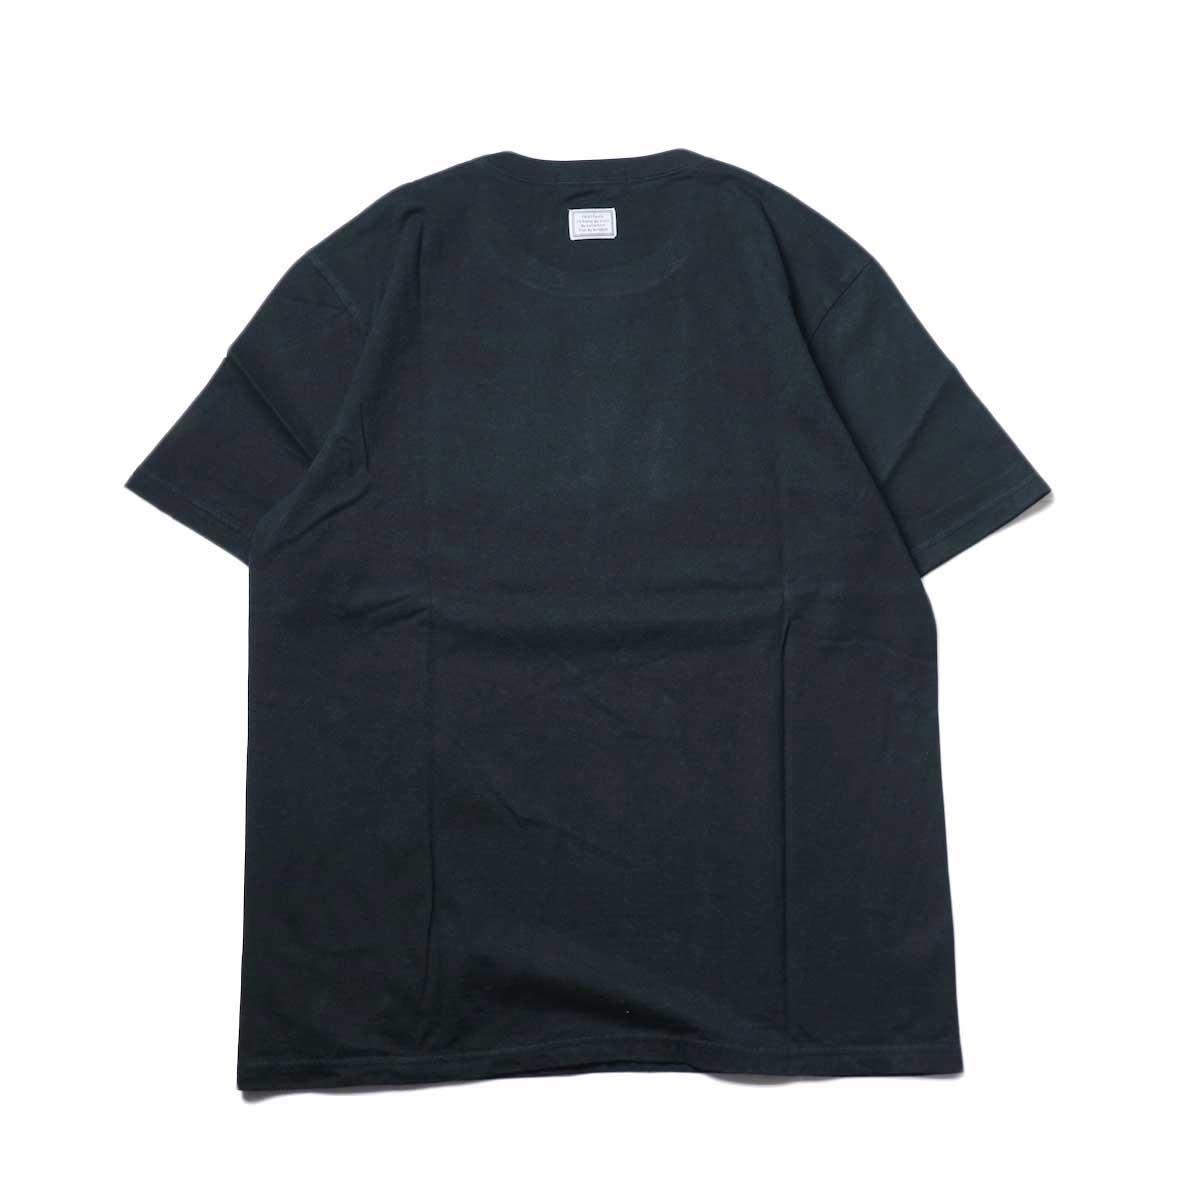 TANGTANG / UNDERCOVER -CHILDREN (Black)背面